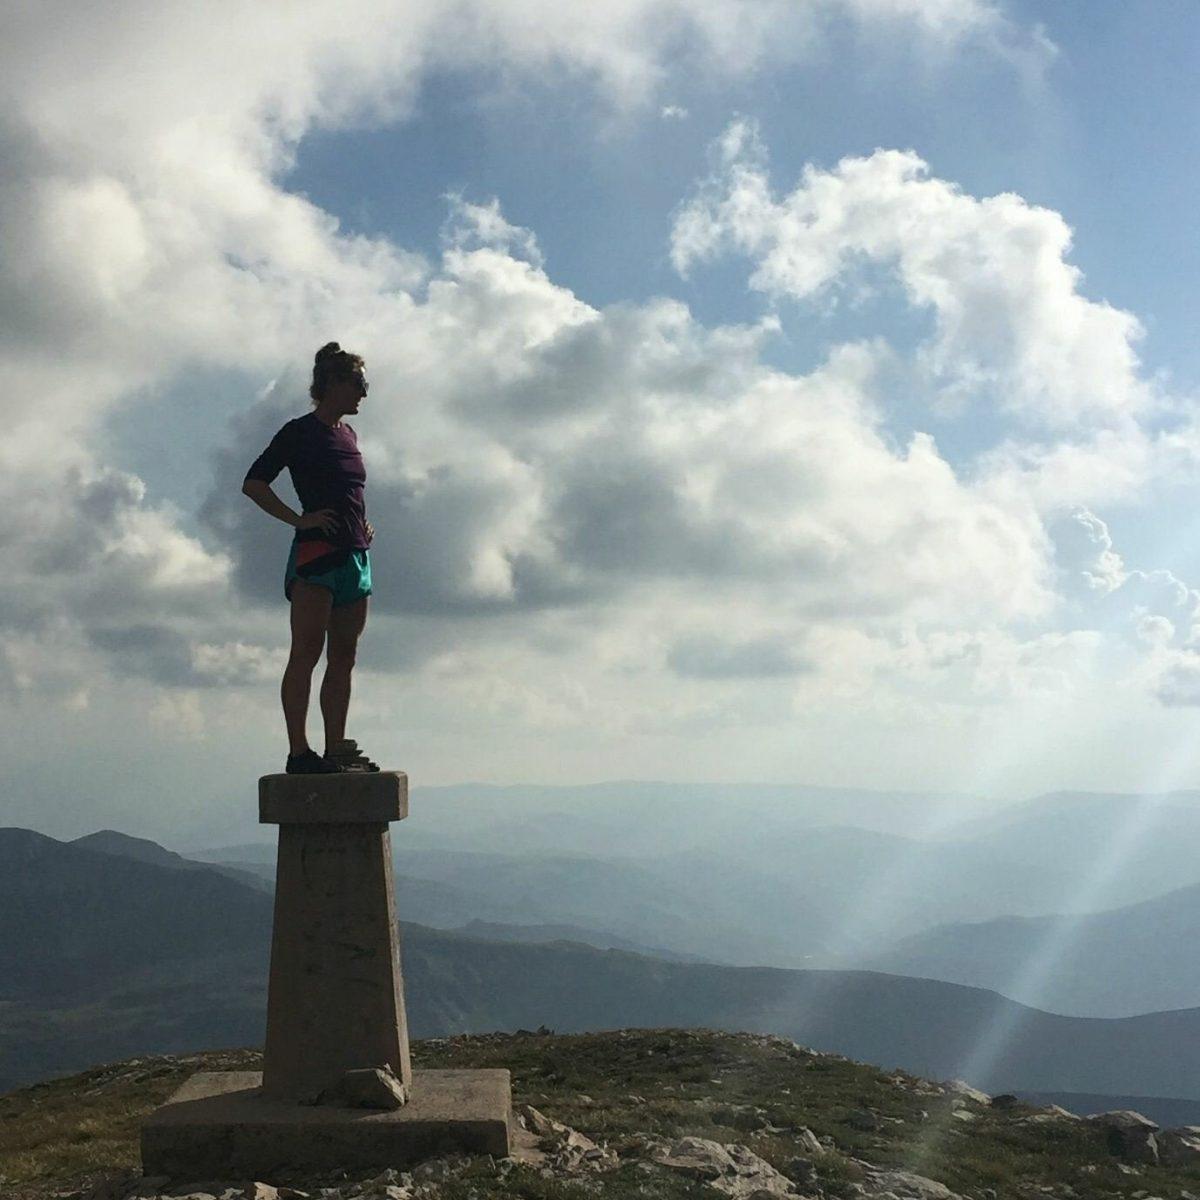 On top of Titov vrv | Sharr Mountain, North Macedonia